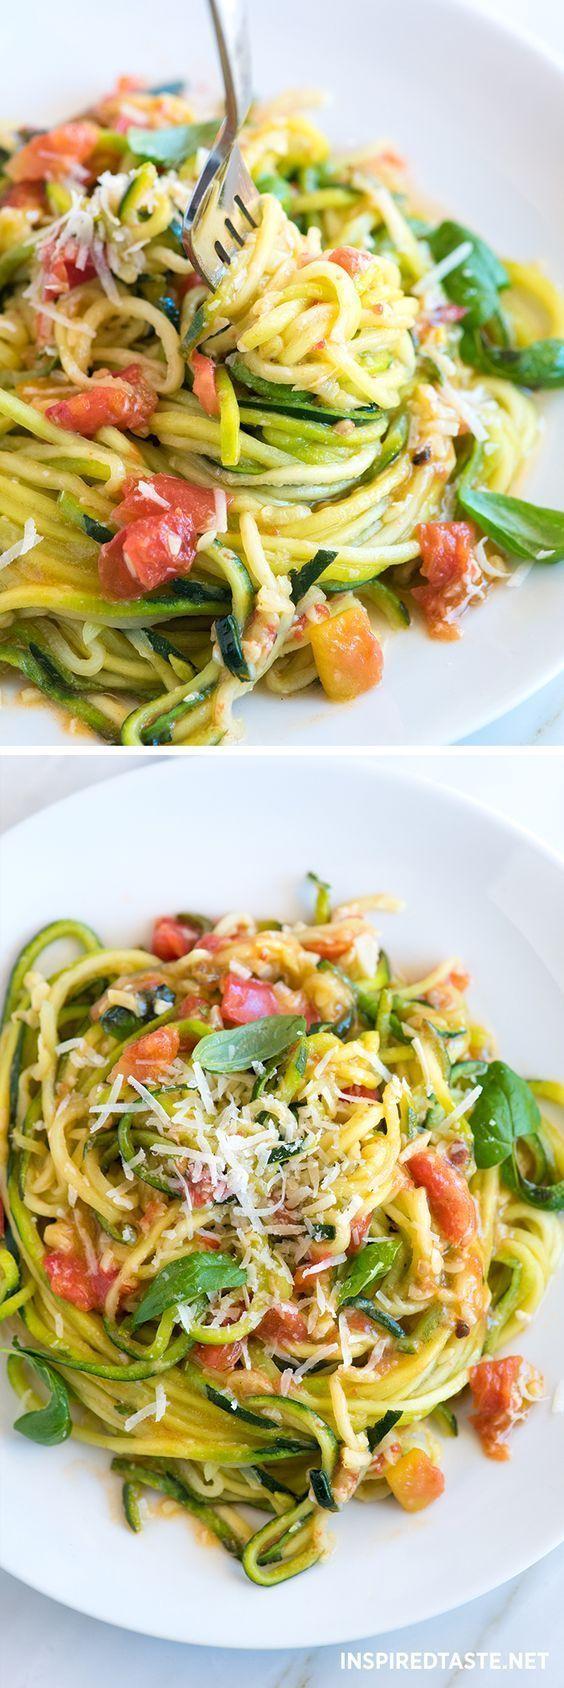 20 Minute Zoodle, Garlic + Parmesan Salad #veggielove #lowcarb